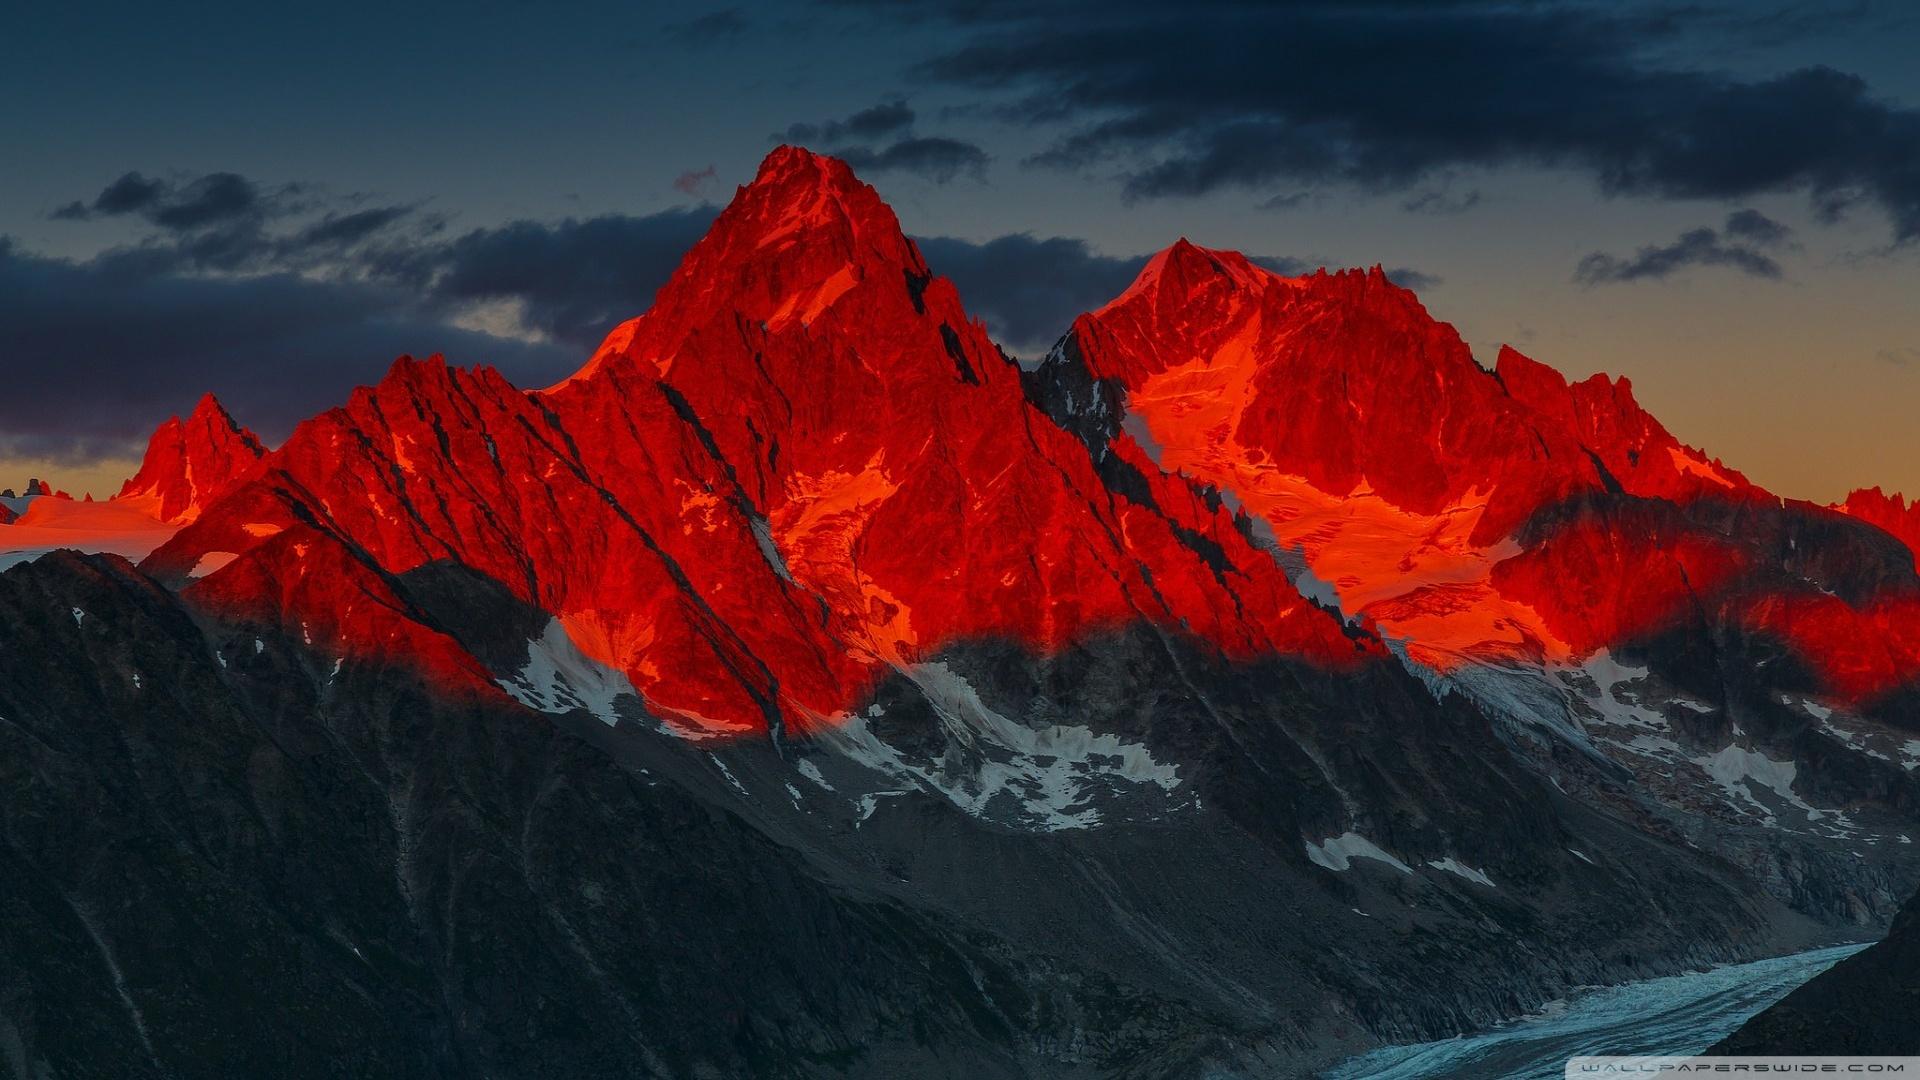 Best 55 Alpenglow Wallpaper on HipWallpaper Alpenglow Wallpaper 1920x1080